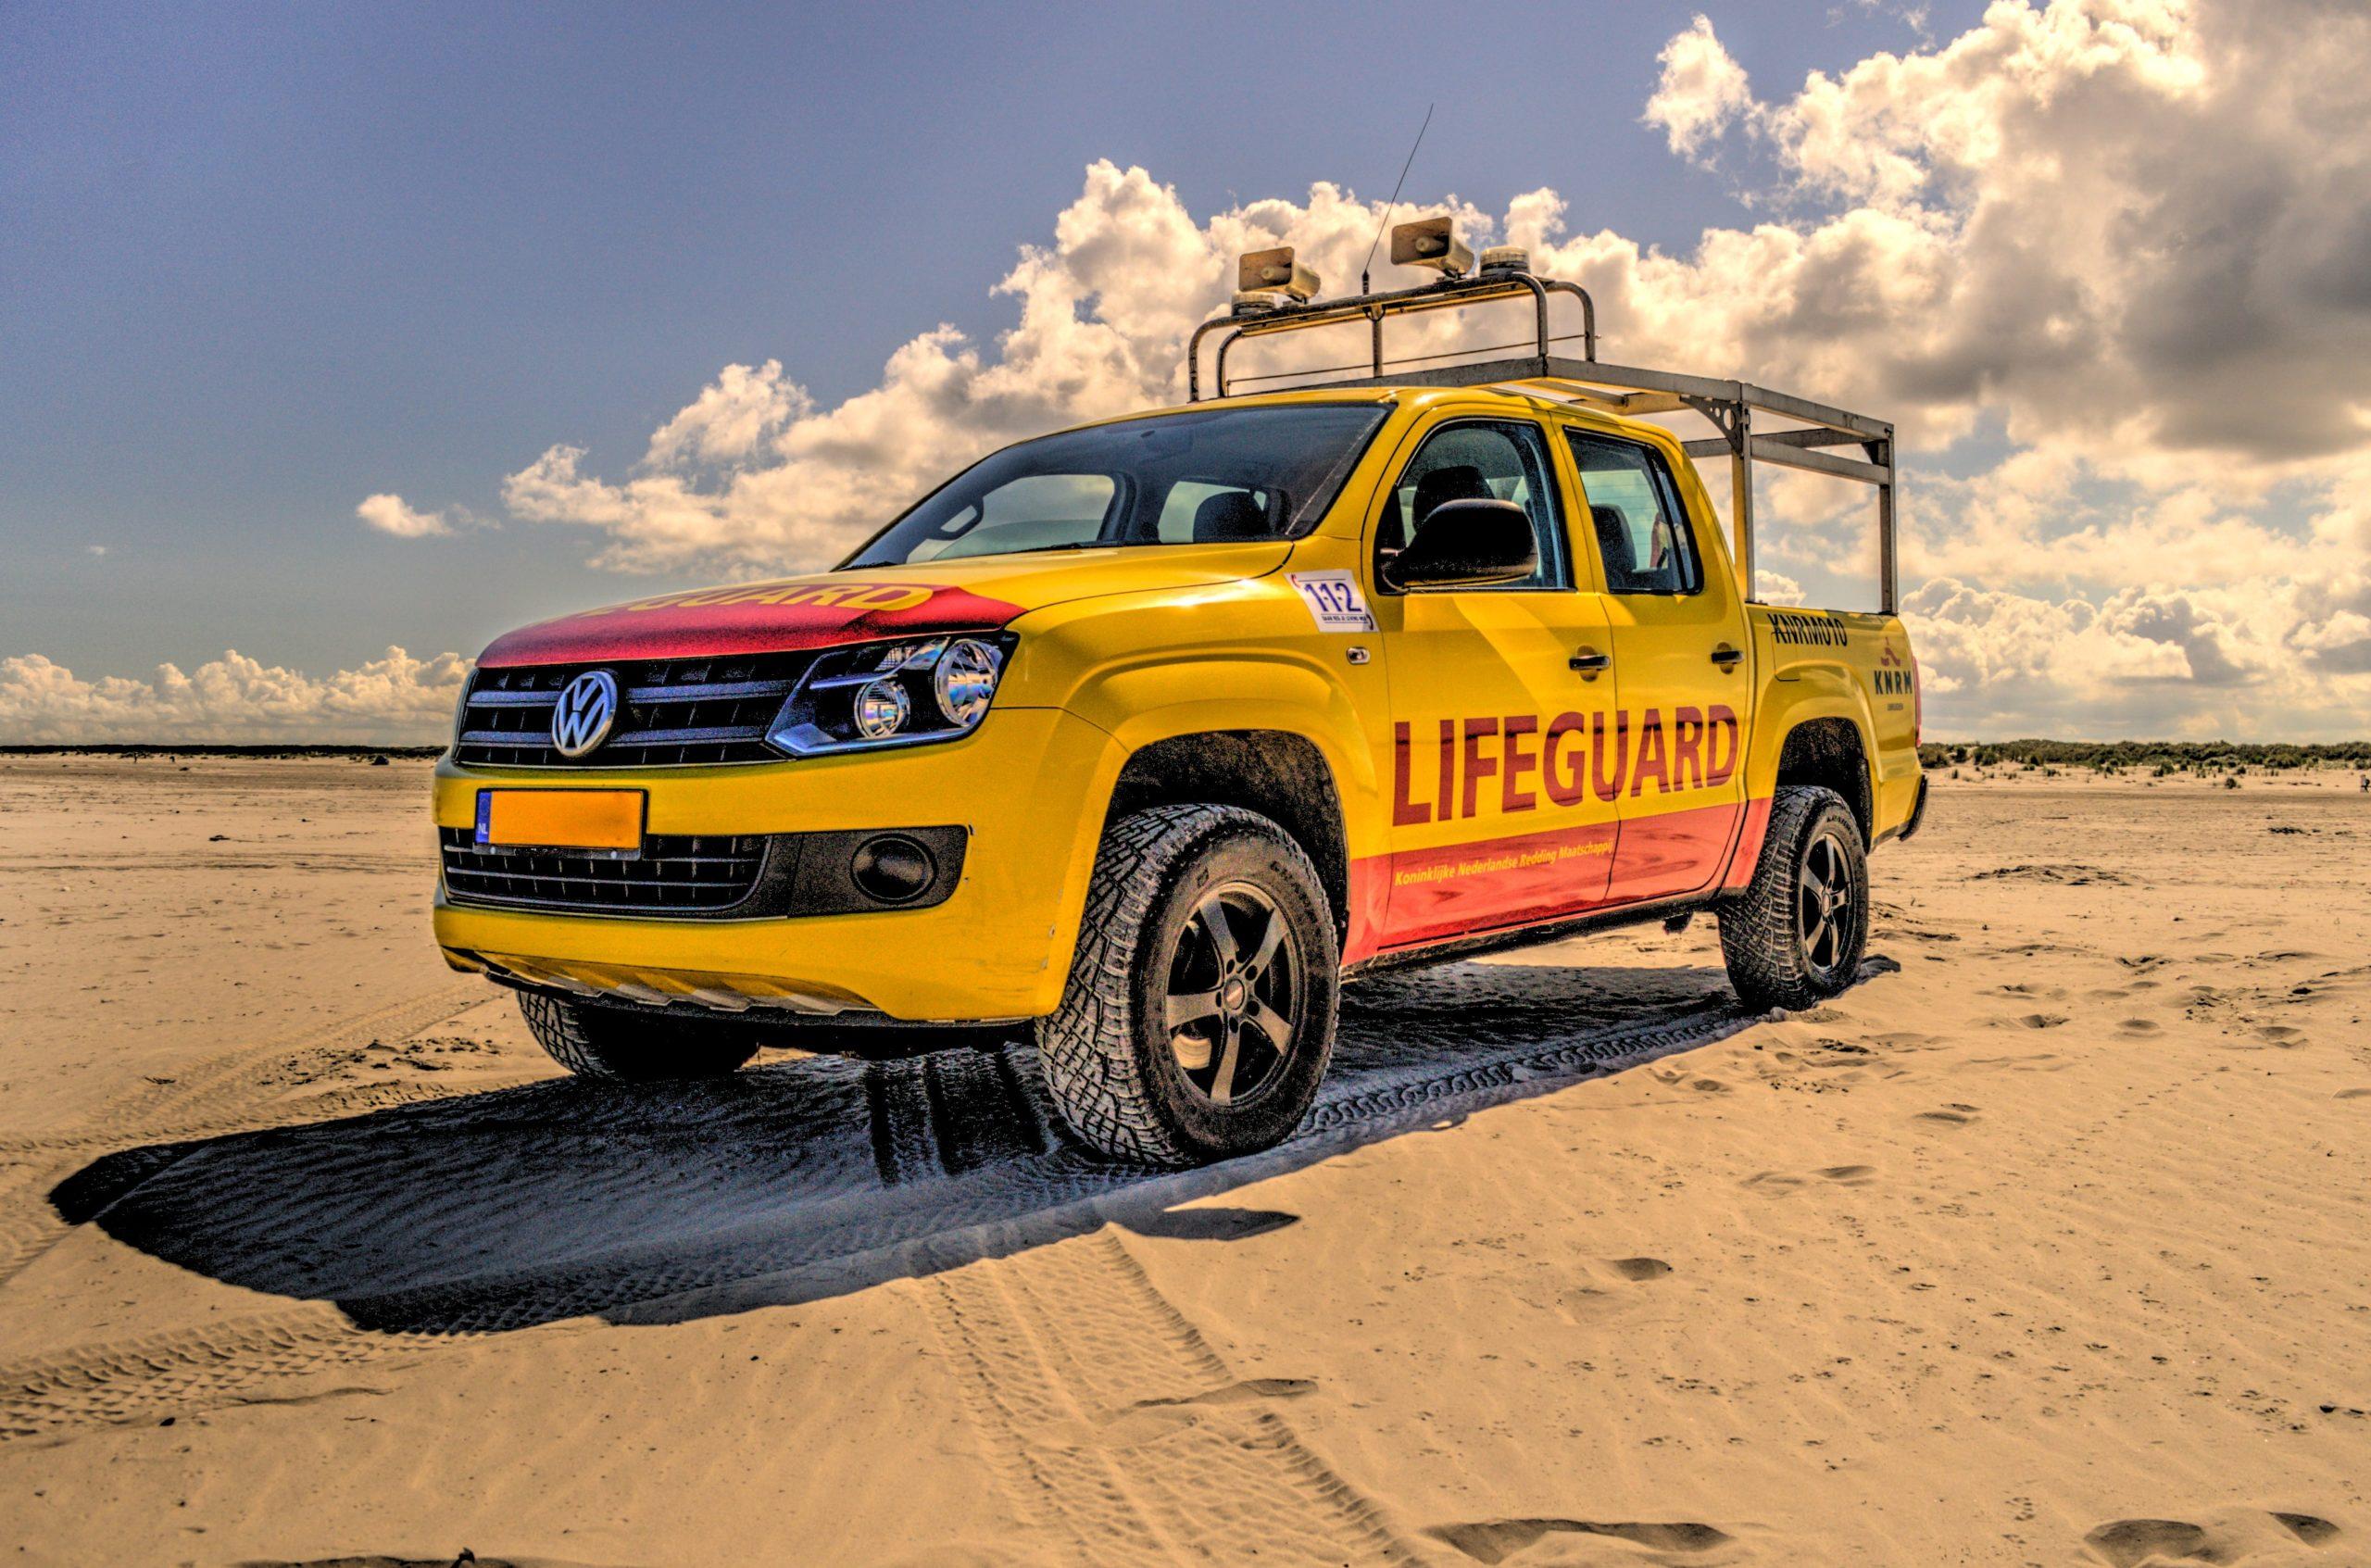 beach-holiday-clouds-lifeguard-9305